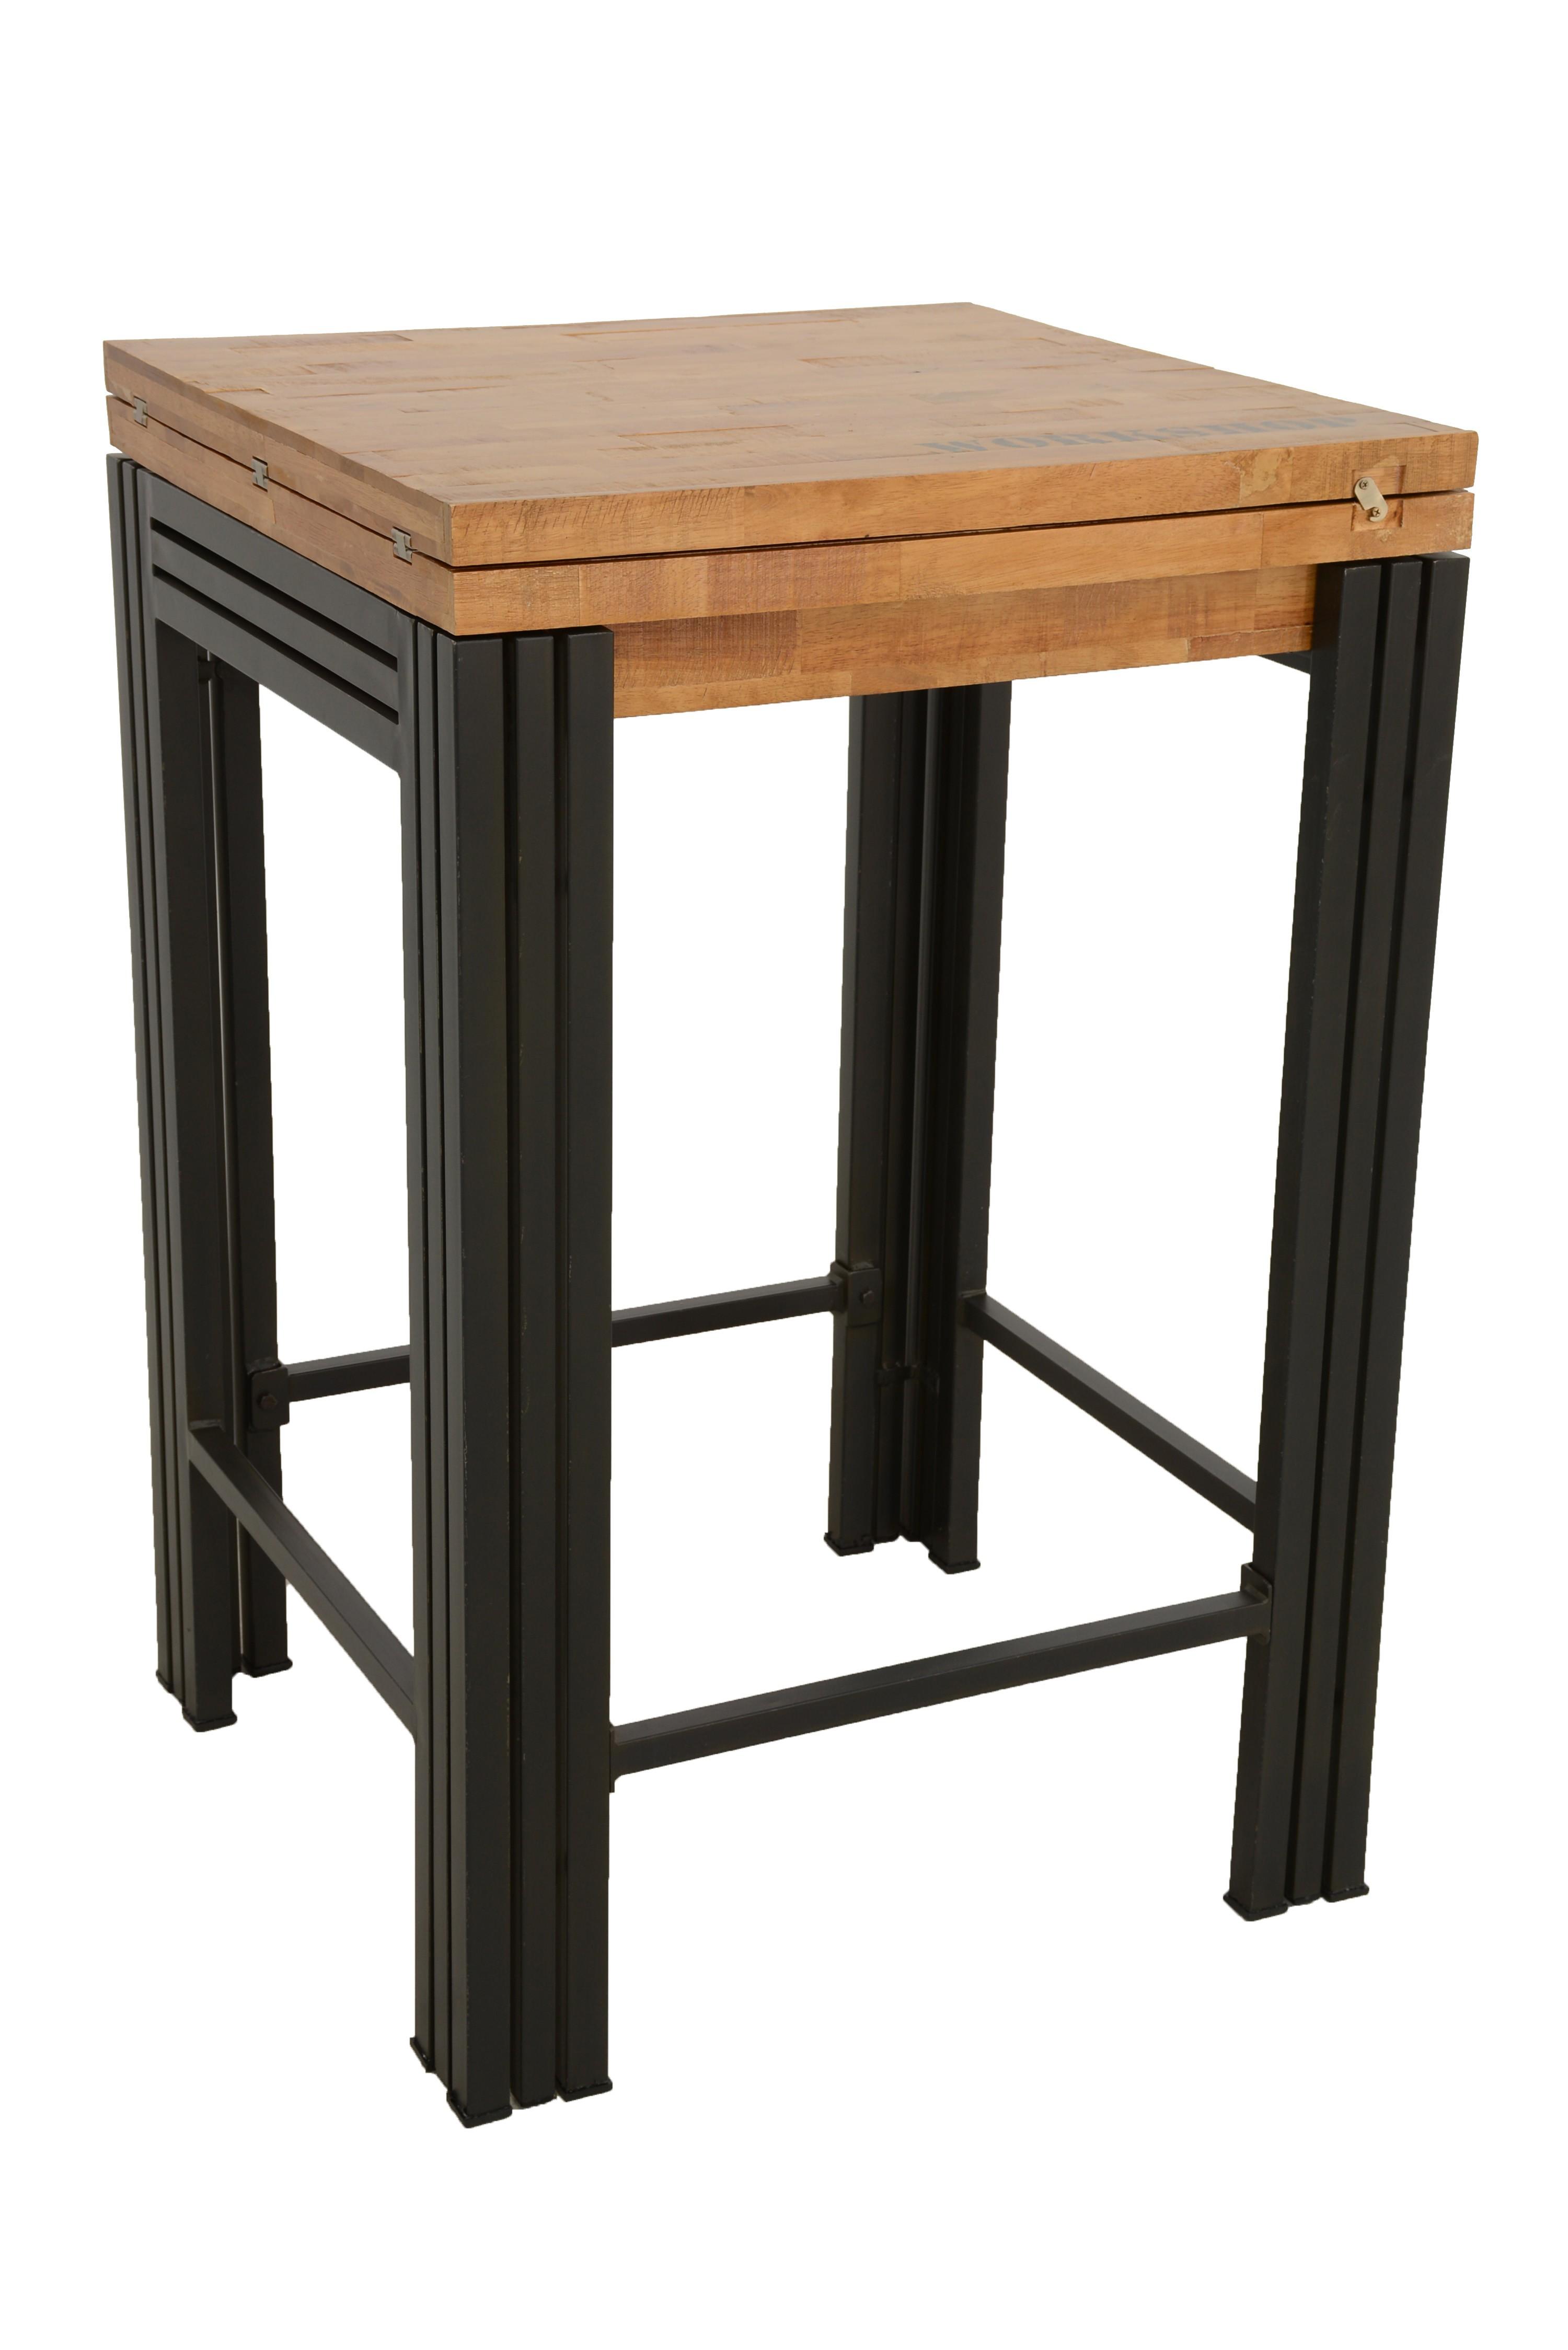 Table bar mange debout carr e extensible h v a recycl Table bois metal extensible